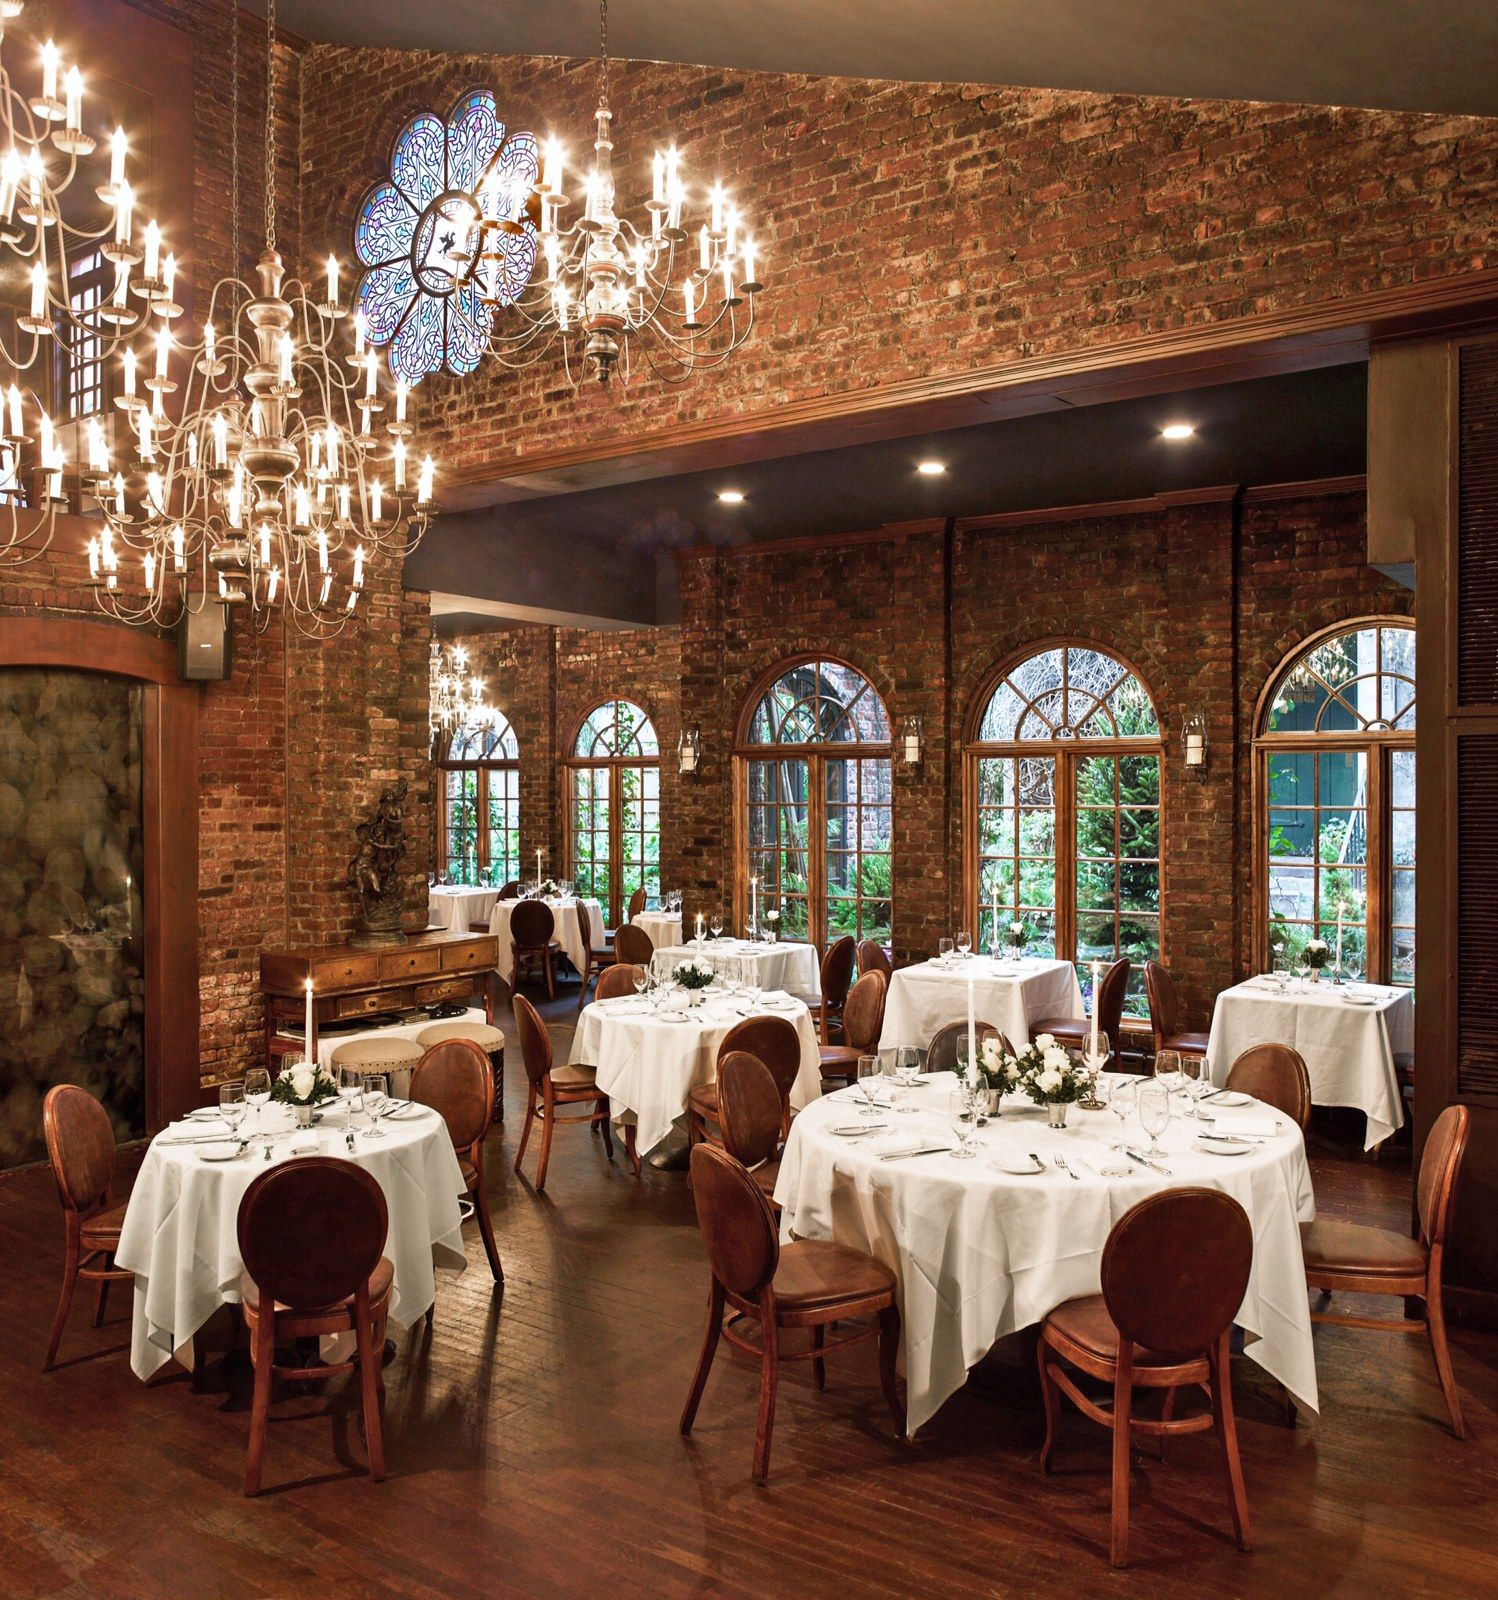 The Most Romantic Restaurants In The World Romantic Restaurant